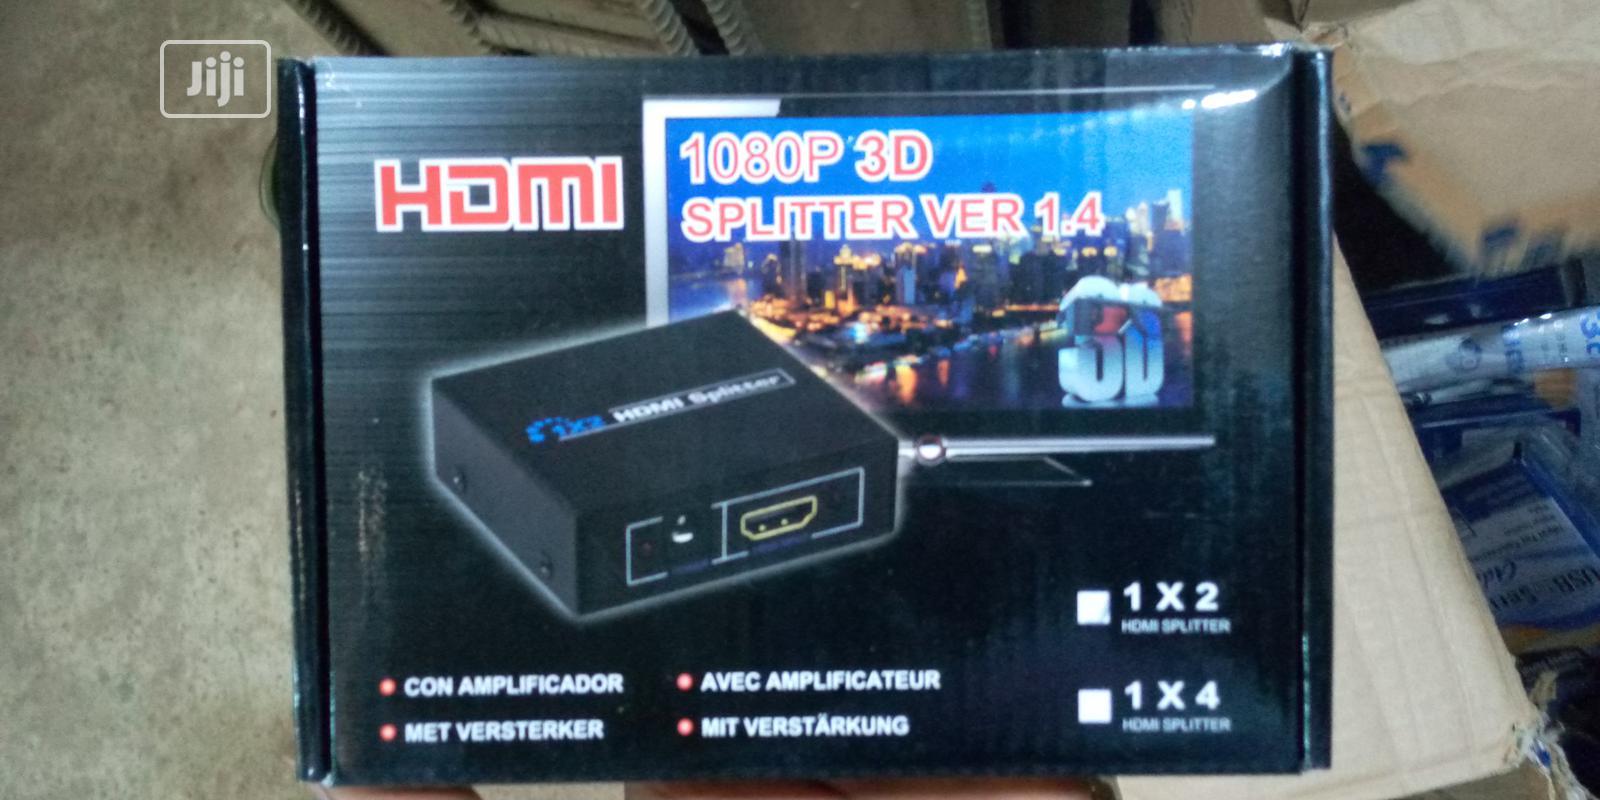 Archive: HDMI 1080P 3D Ver 1.4 Splitter